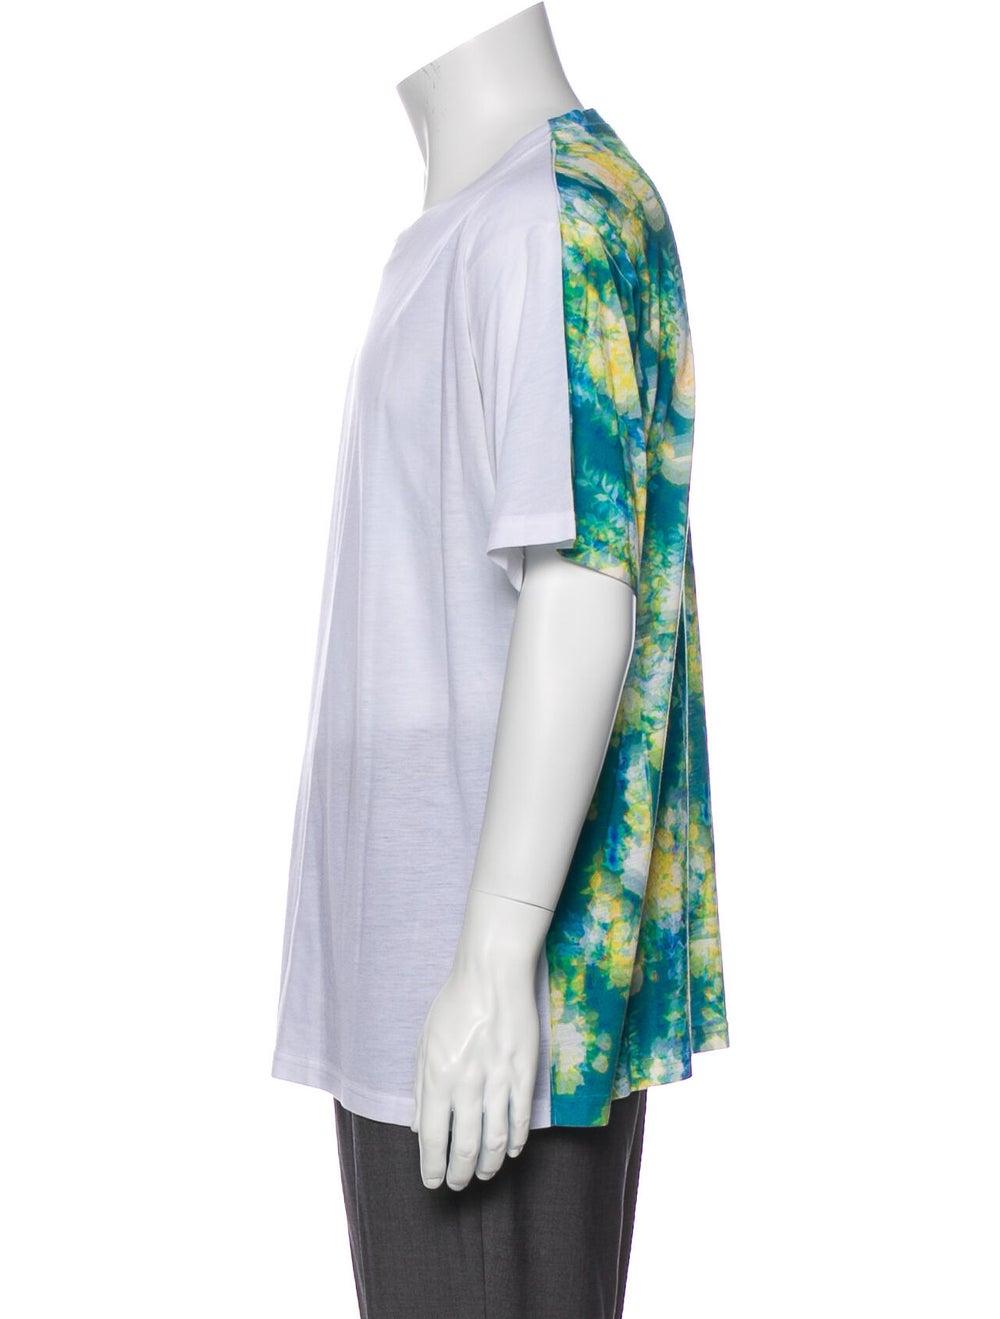 Craig Green Tie-Dye Print Crew Neck T-Shirt Green - image 2